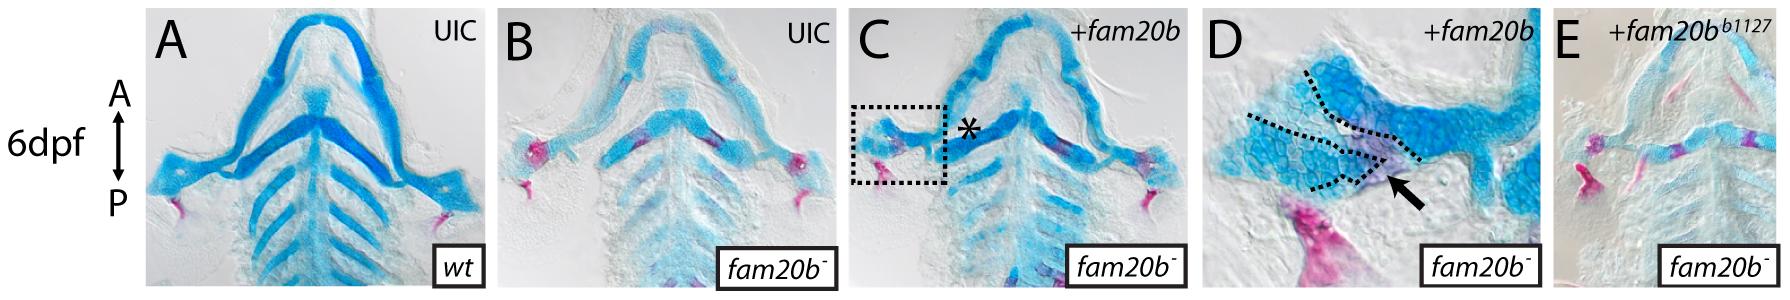 Wild-type <i>fam20b</i> expression rescues the <i>fam20b<sup>b1127</sup></i> mutant phenotype.